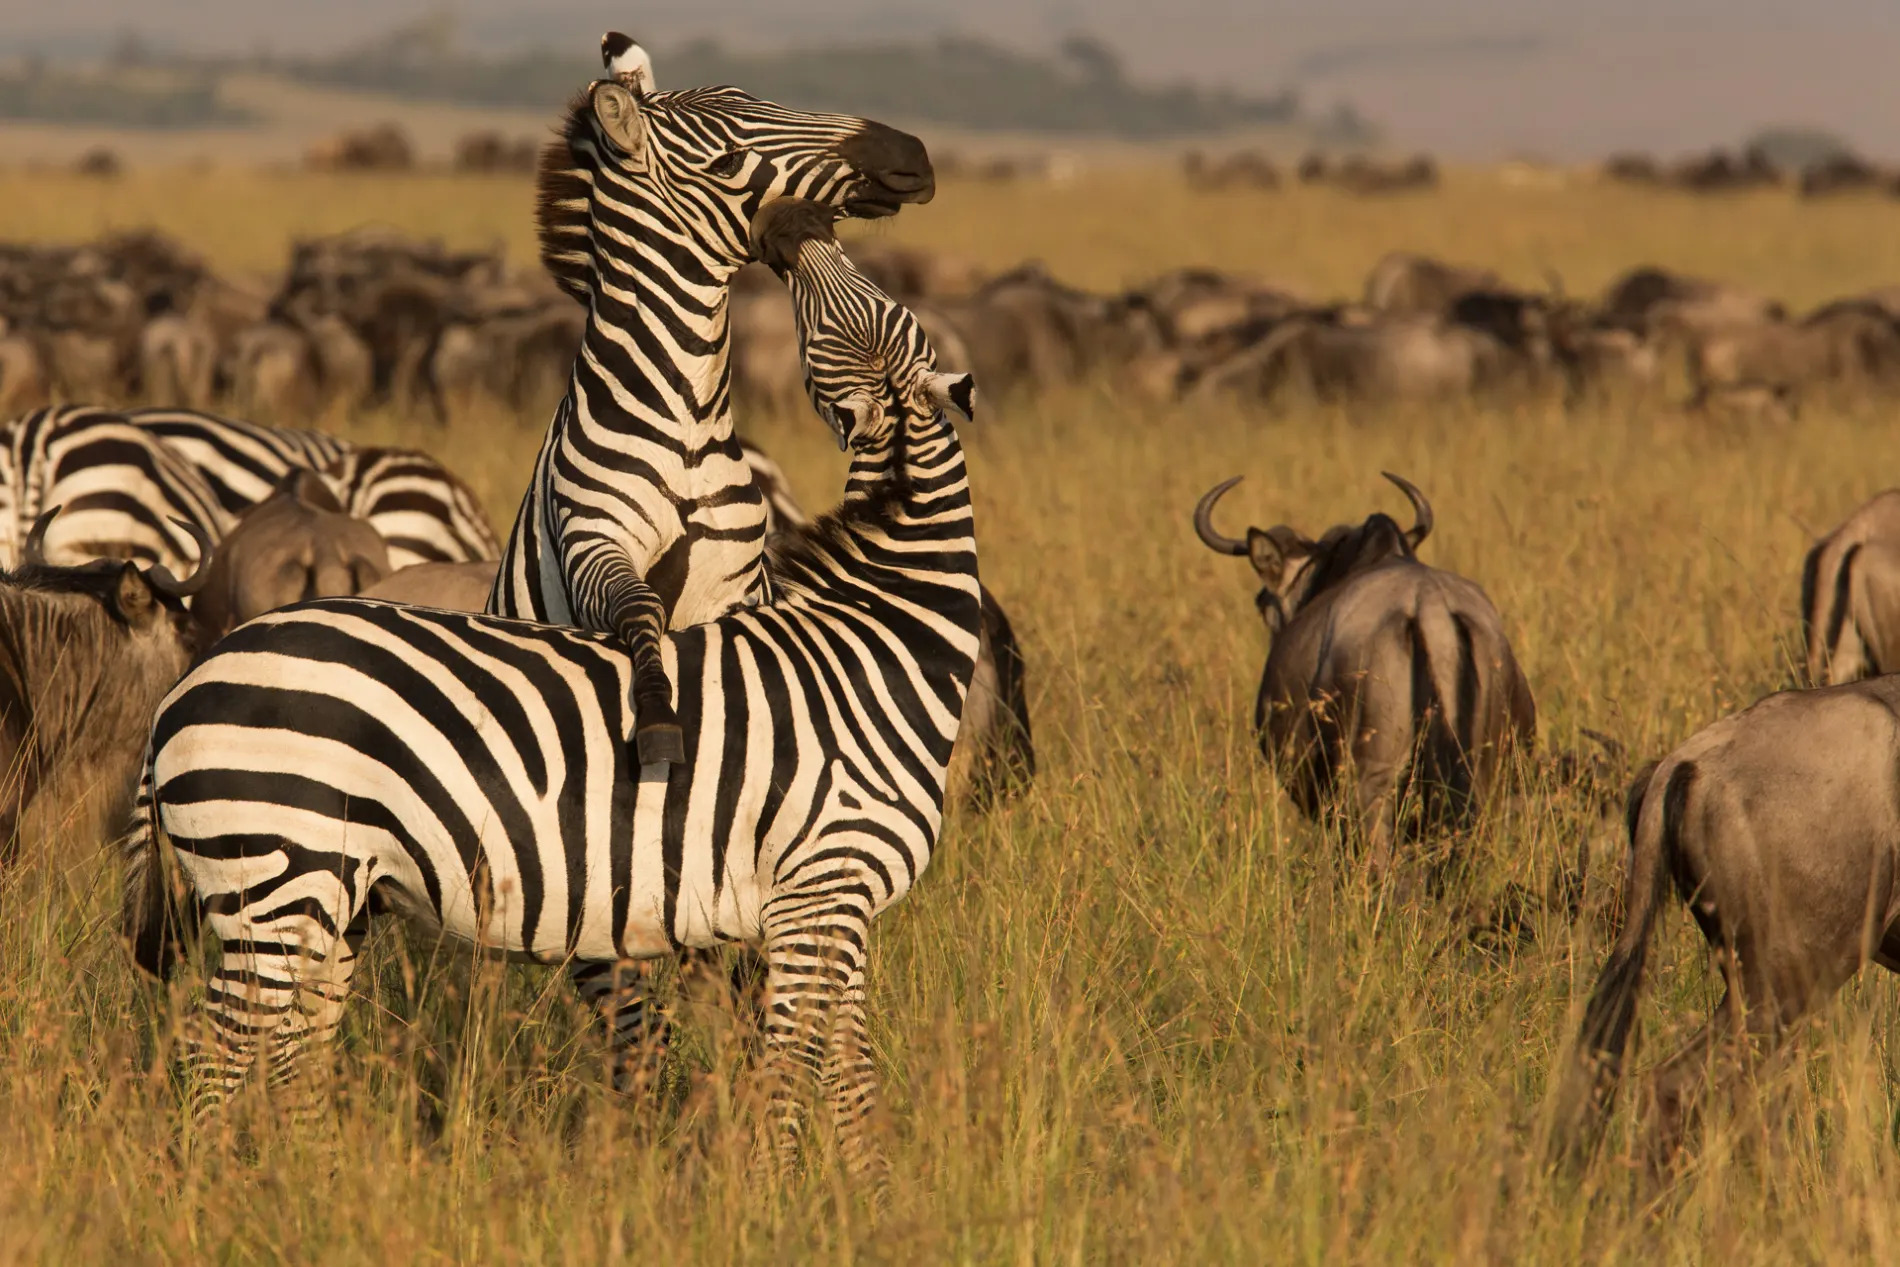 Zebra climbing